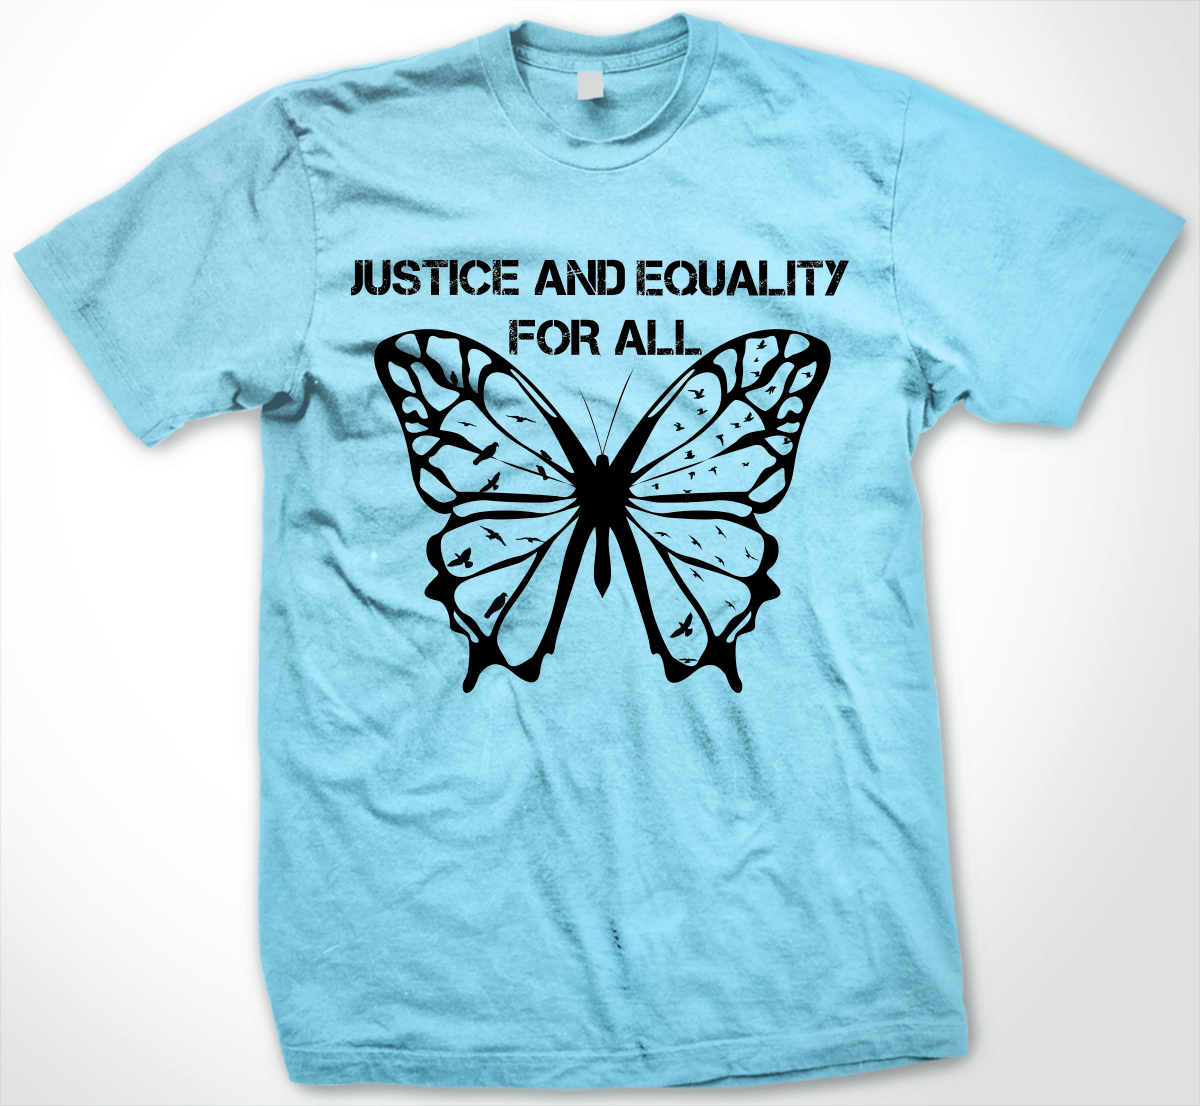 Shirt design australia - T Shirt Design By Jaden Ranen For Amnesty International Australia T Shirt Design Competition